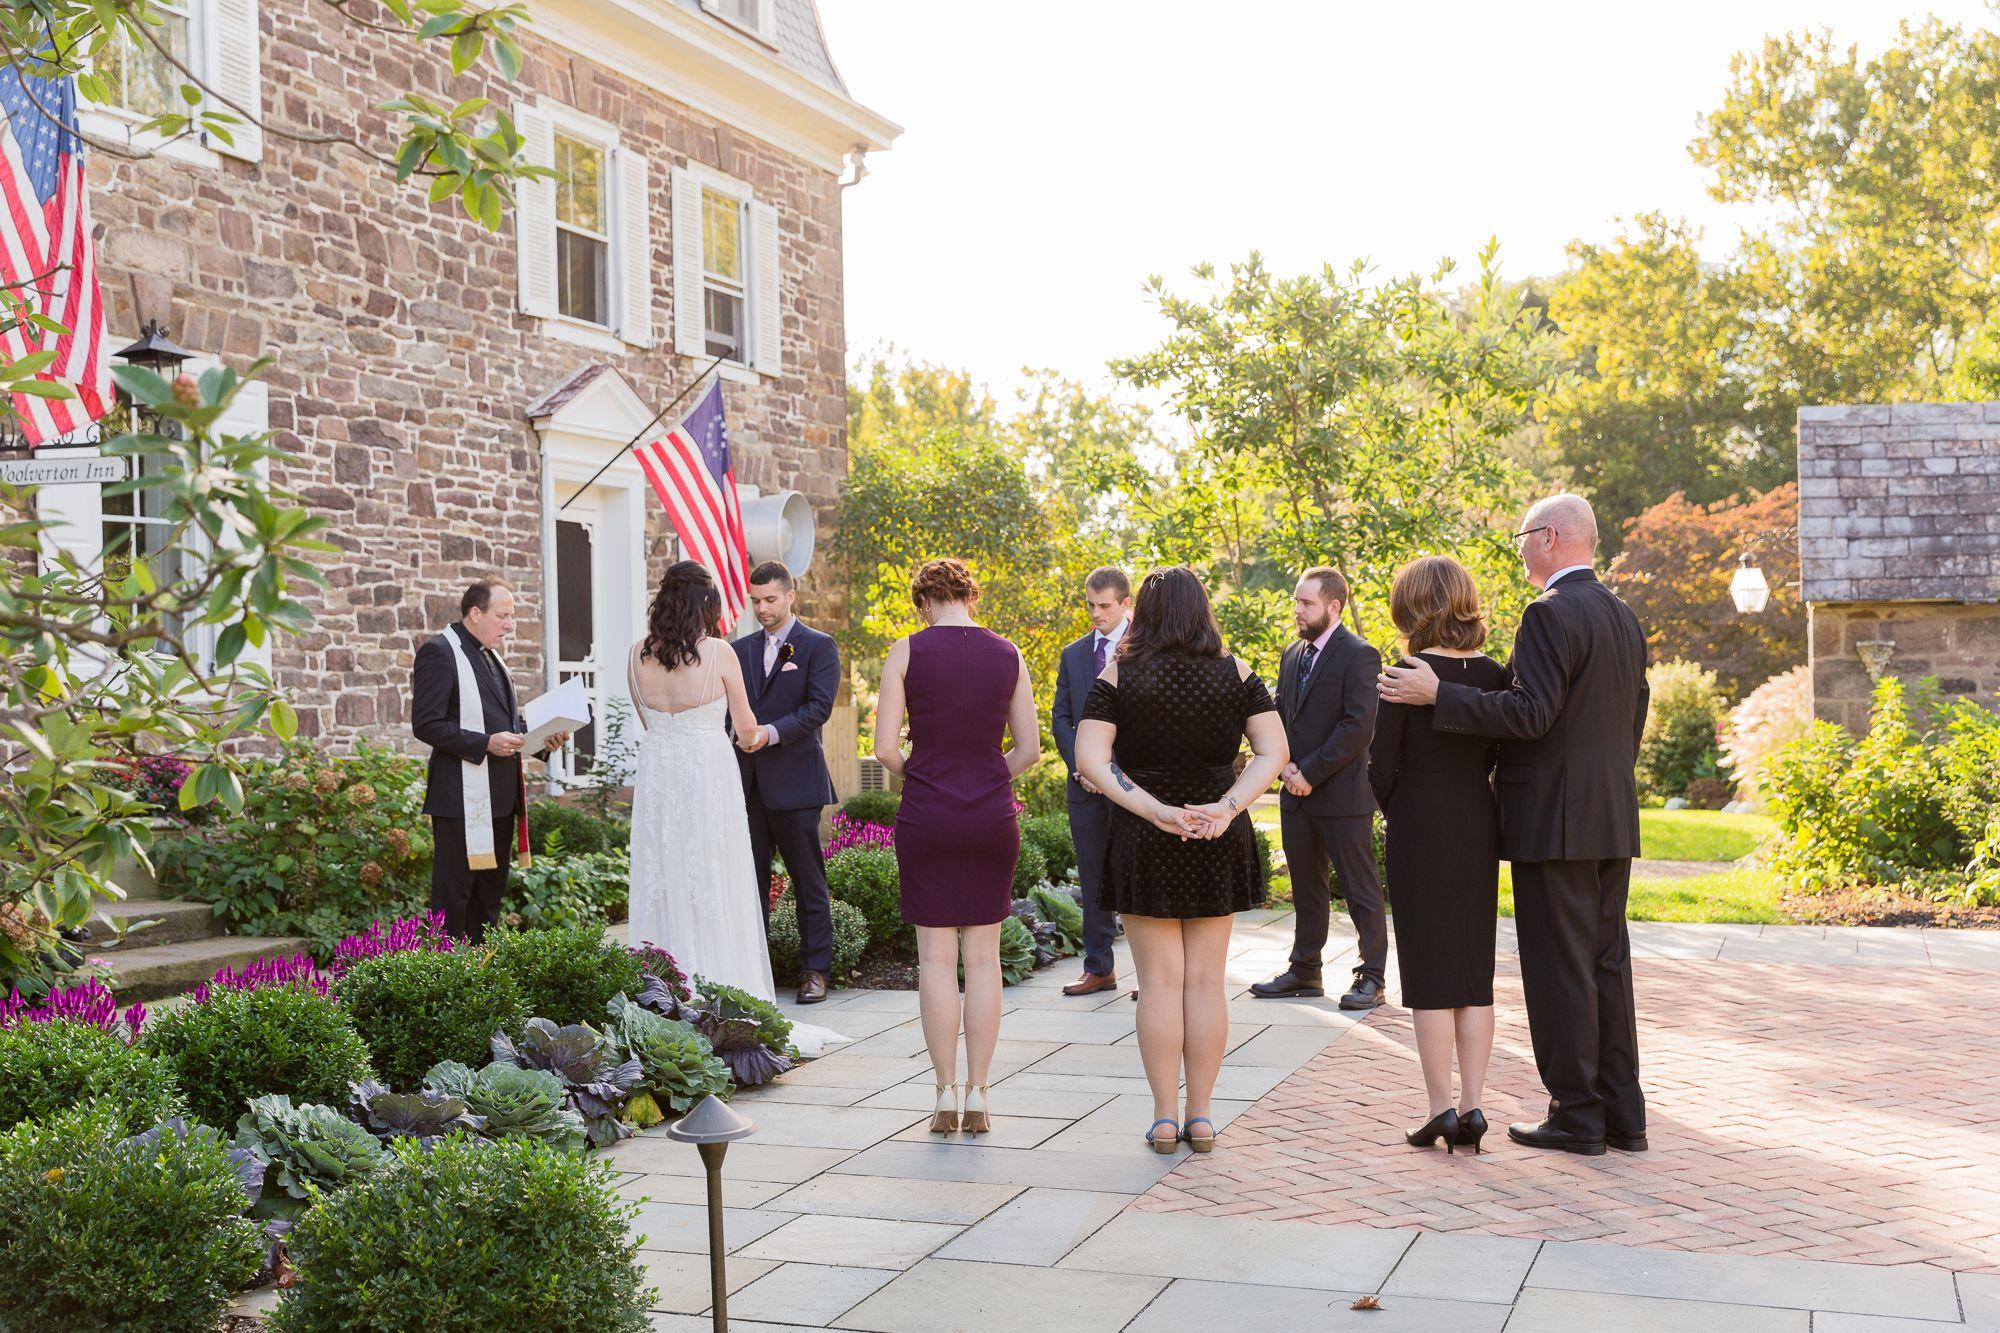 Fall Micro Wedding Ceremony At Woolverton Inn In 2020 Wedding Wedding Photography Ceremony